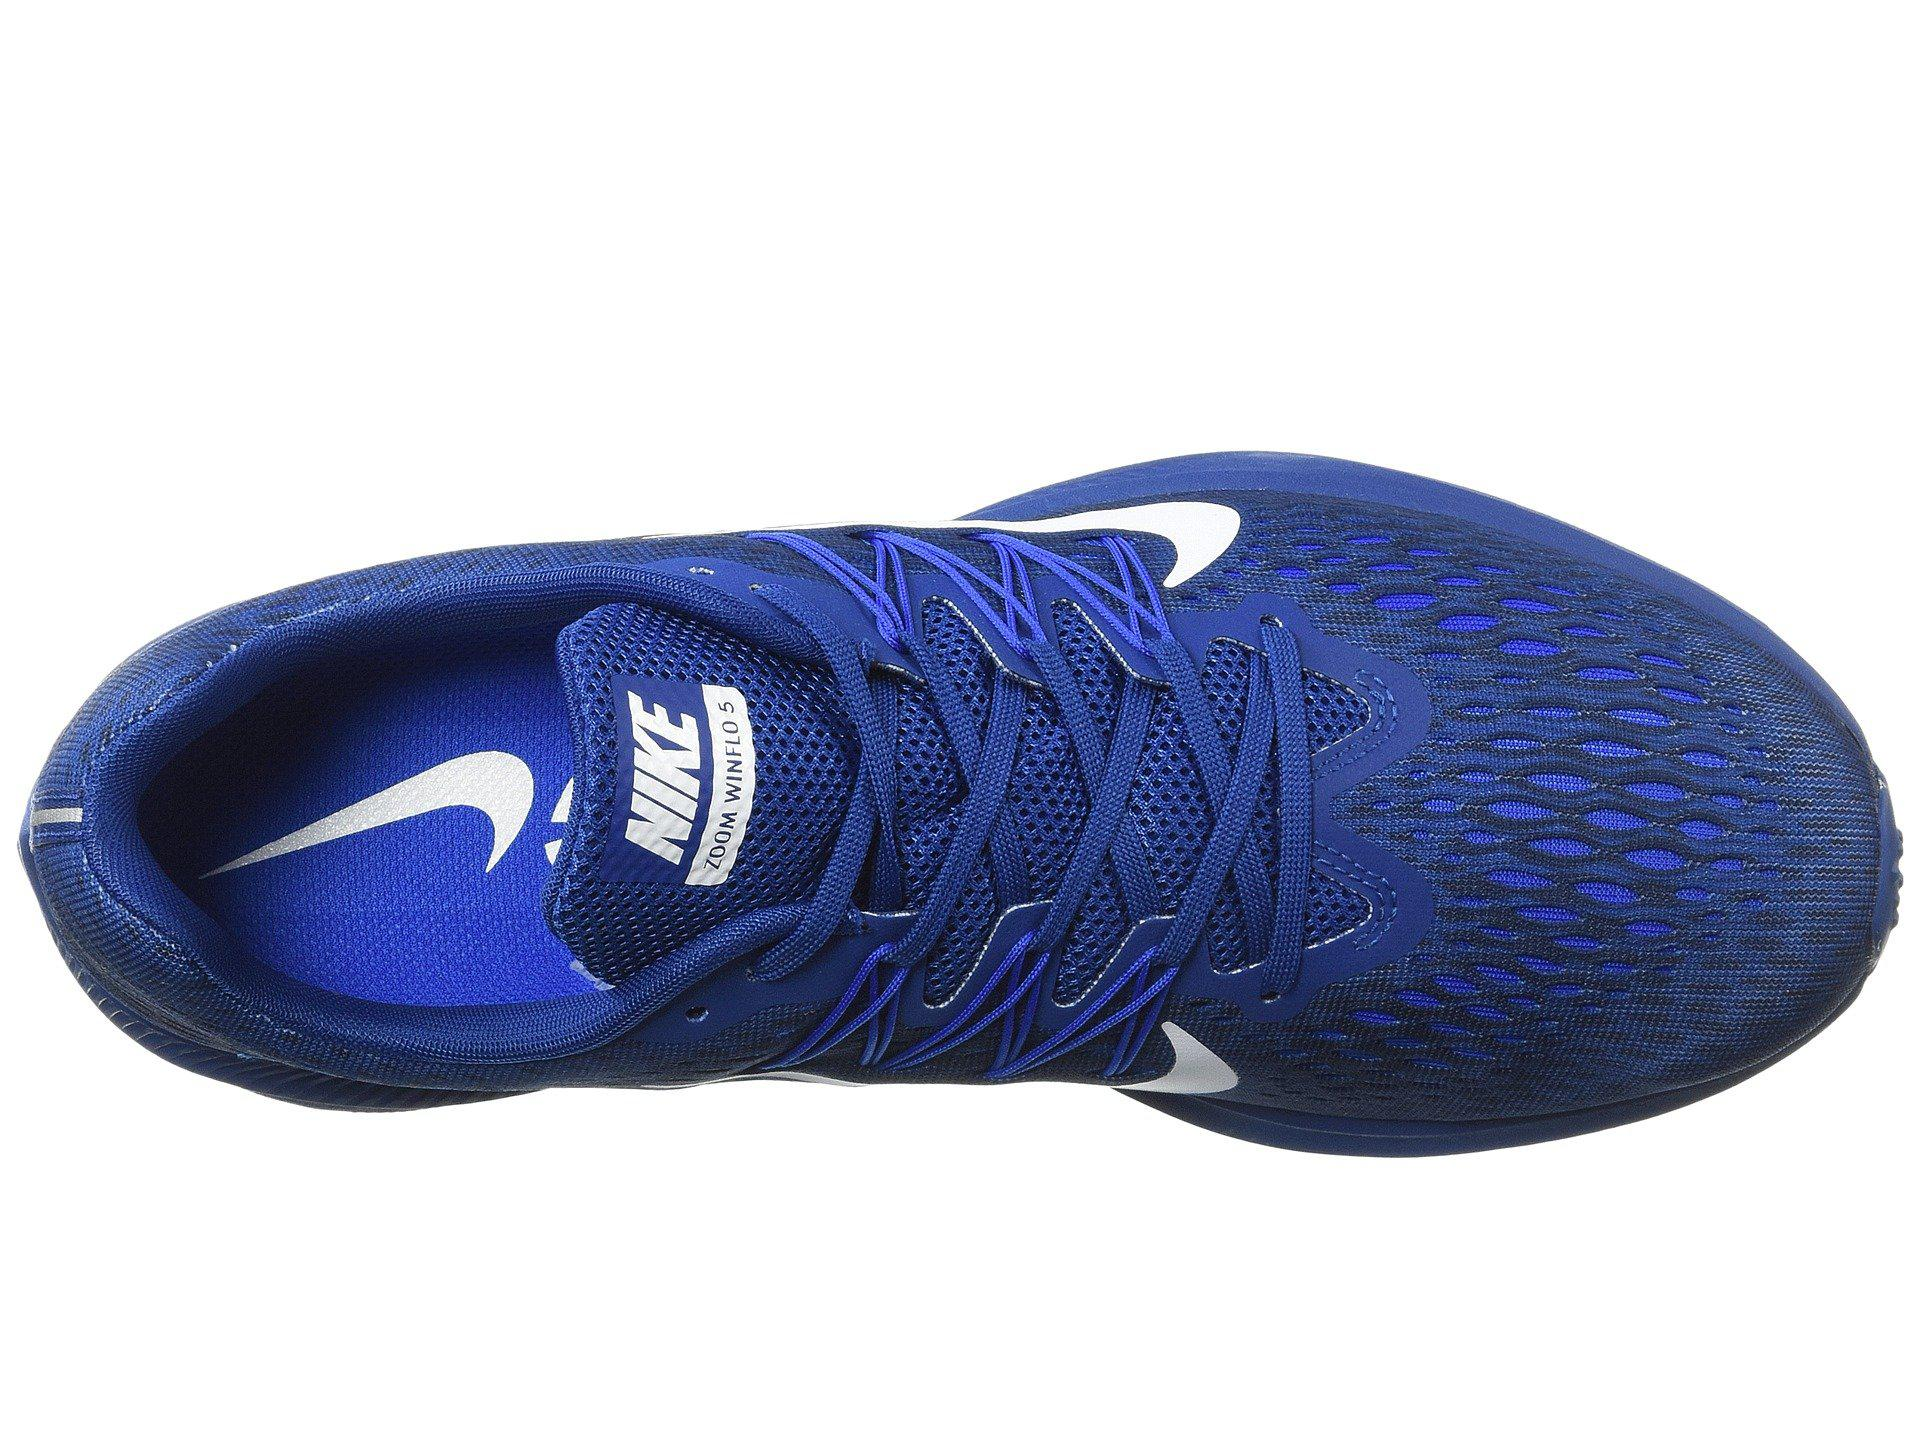 efa8c6316bef Nike - Blue Air Zoom Winflo 5 for Men - Lyst. View fullscreen